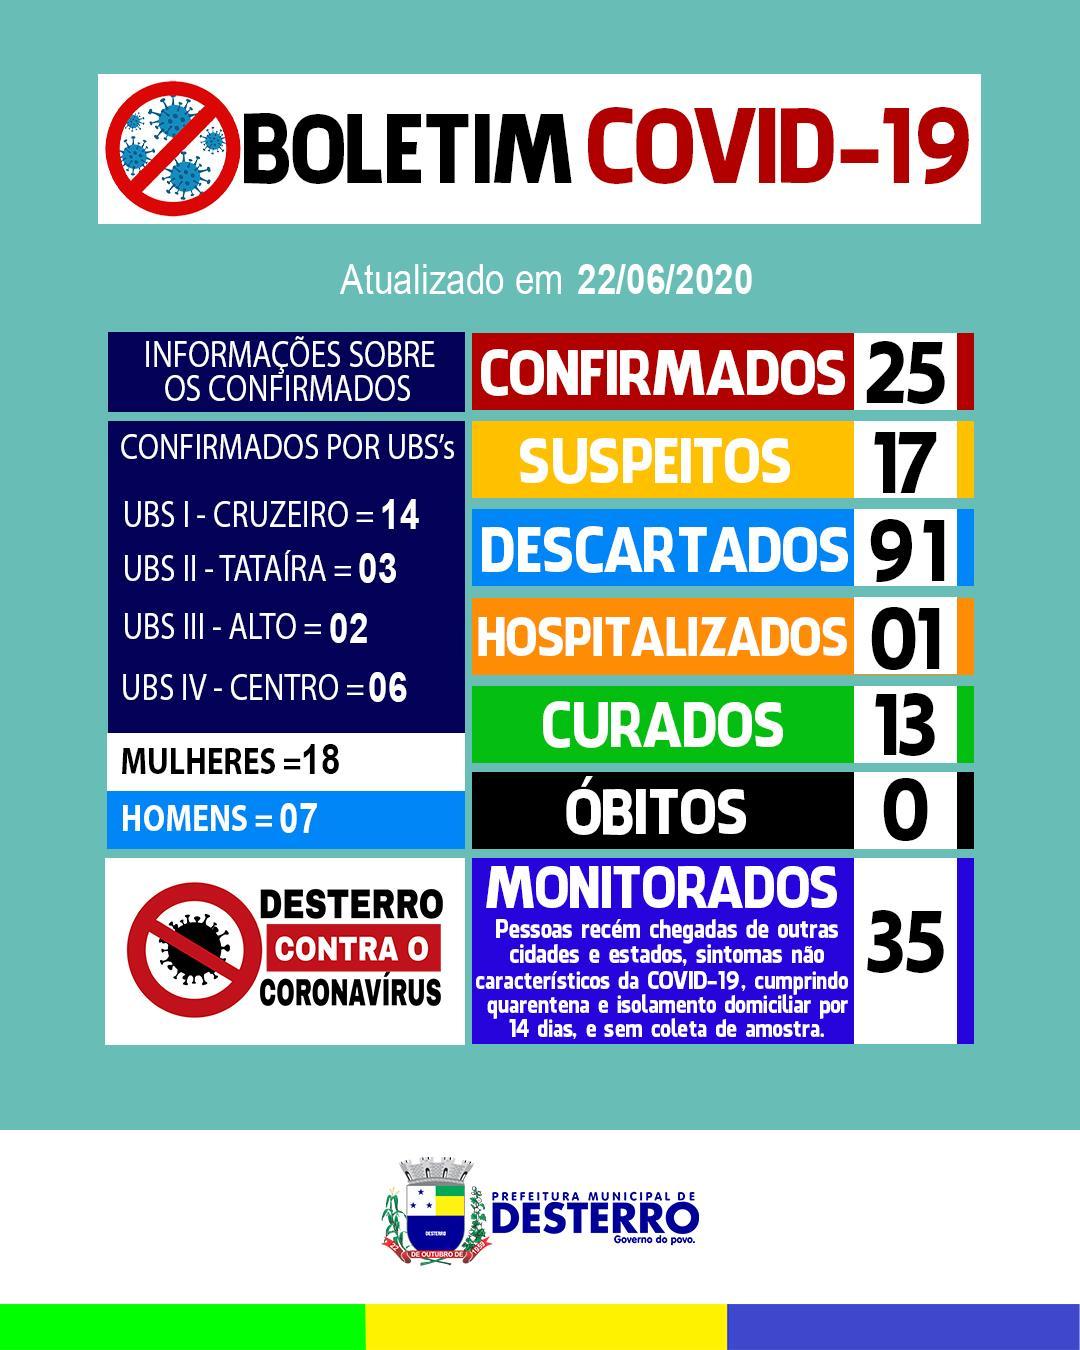 Boletim Covid-19 (22/06/2020)